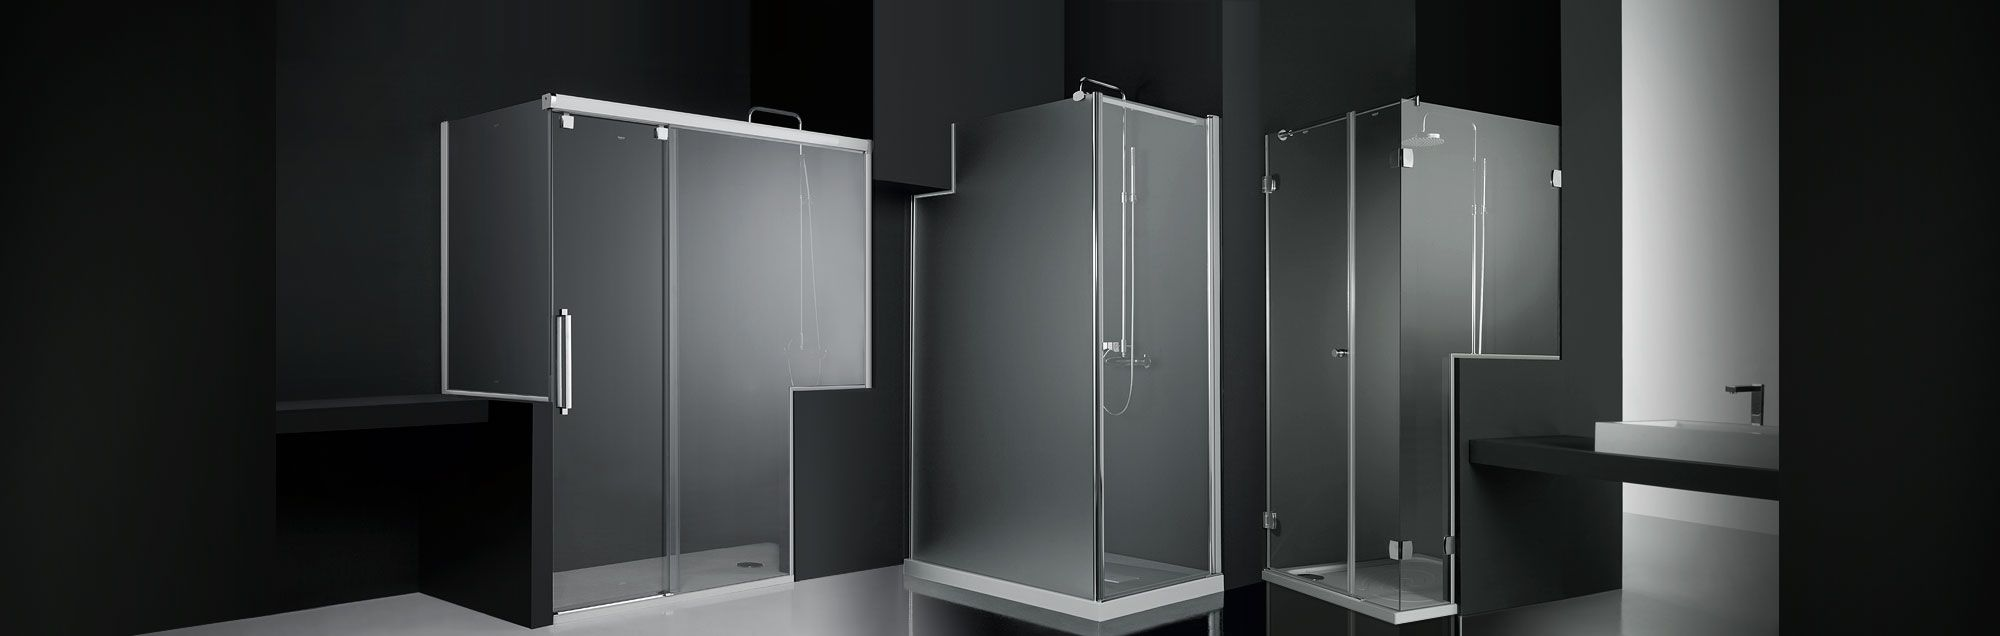 Box doccia con soluzioni speciali profiltek - Pegatinas para mamparas de bano ...